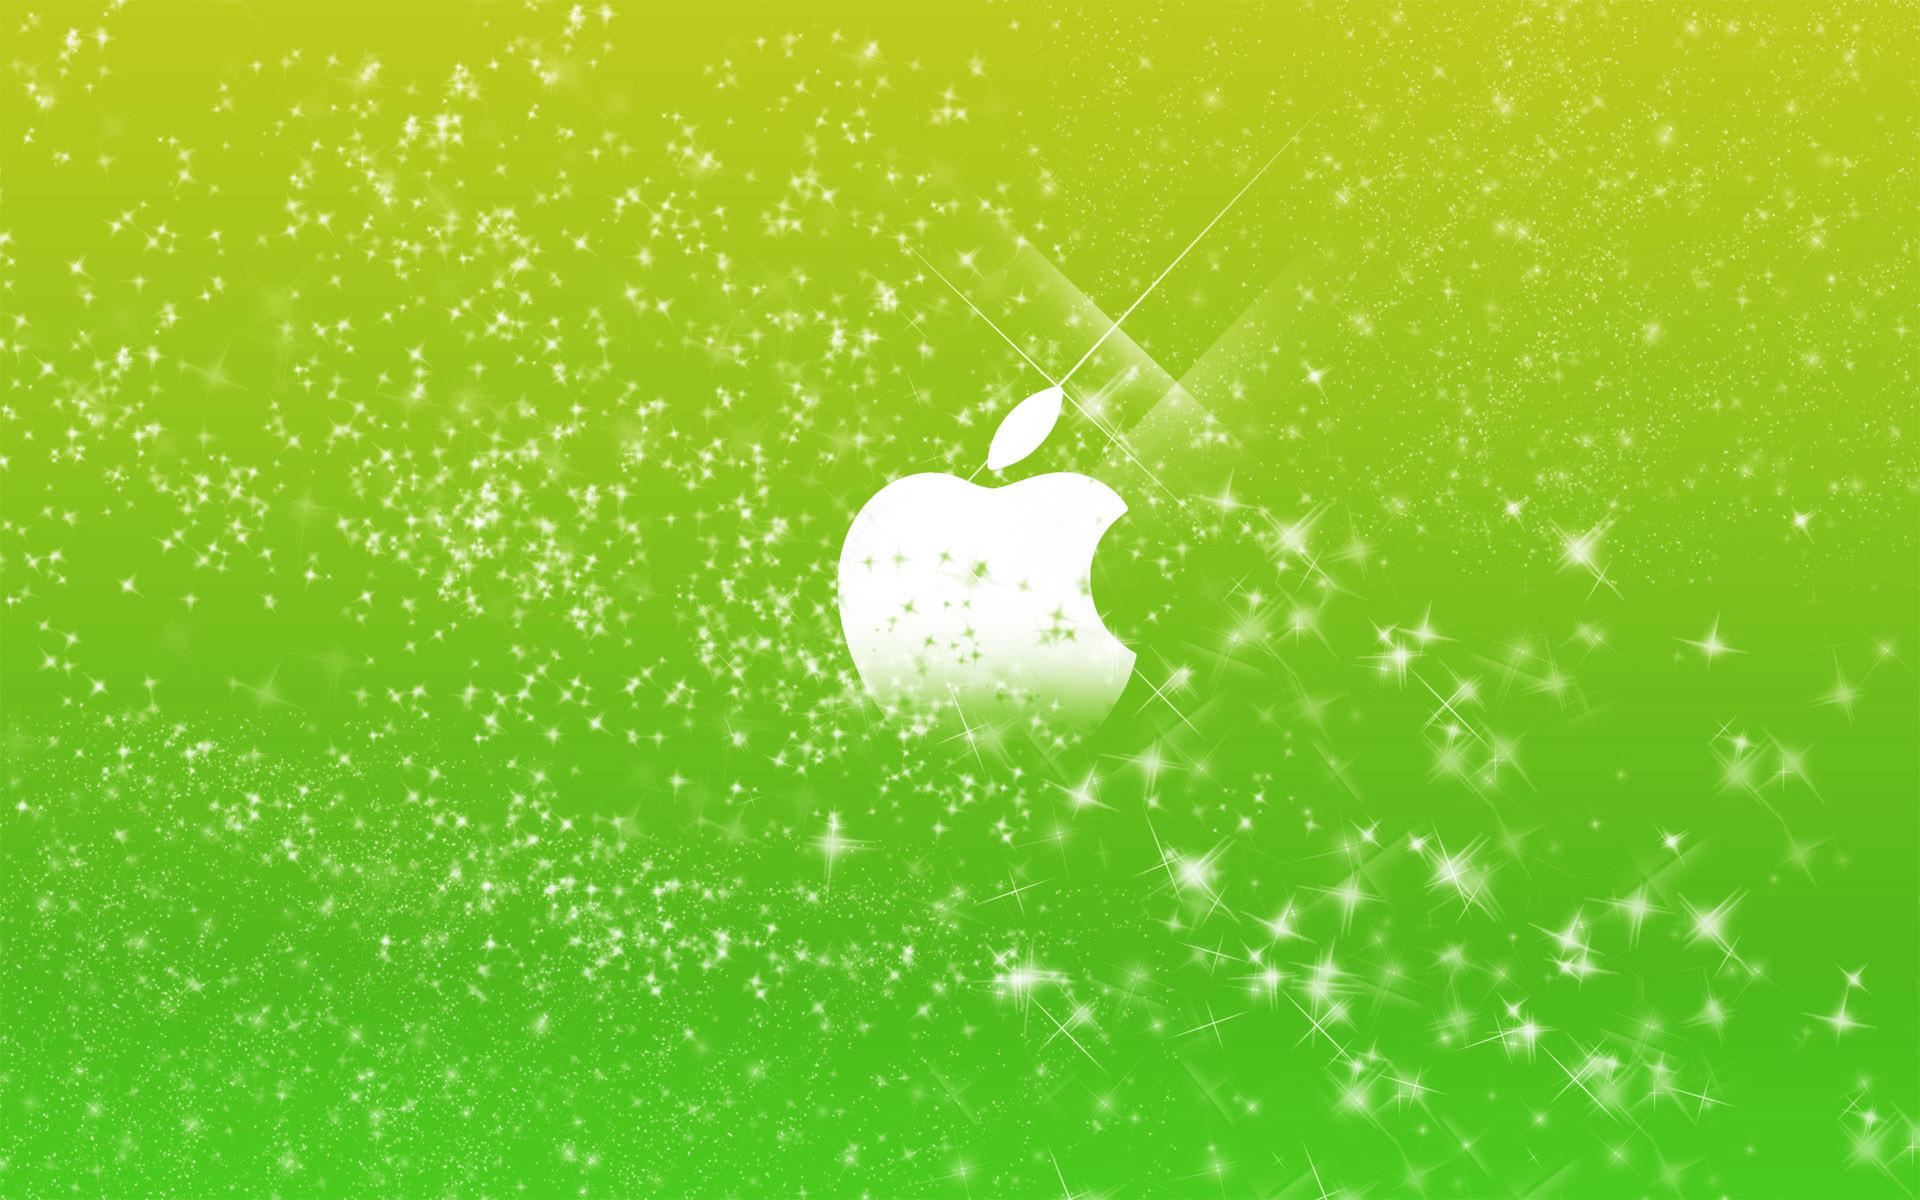 Apple Desktop wallpaper wallpaper free download 640×960 Backgrounds Apple  (29 Wallpapers)  